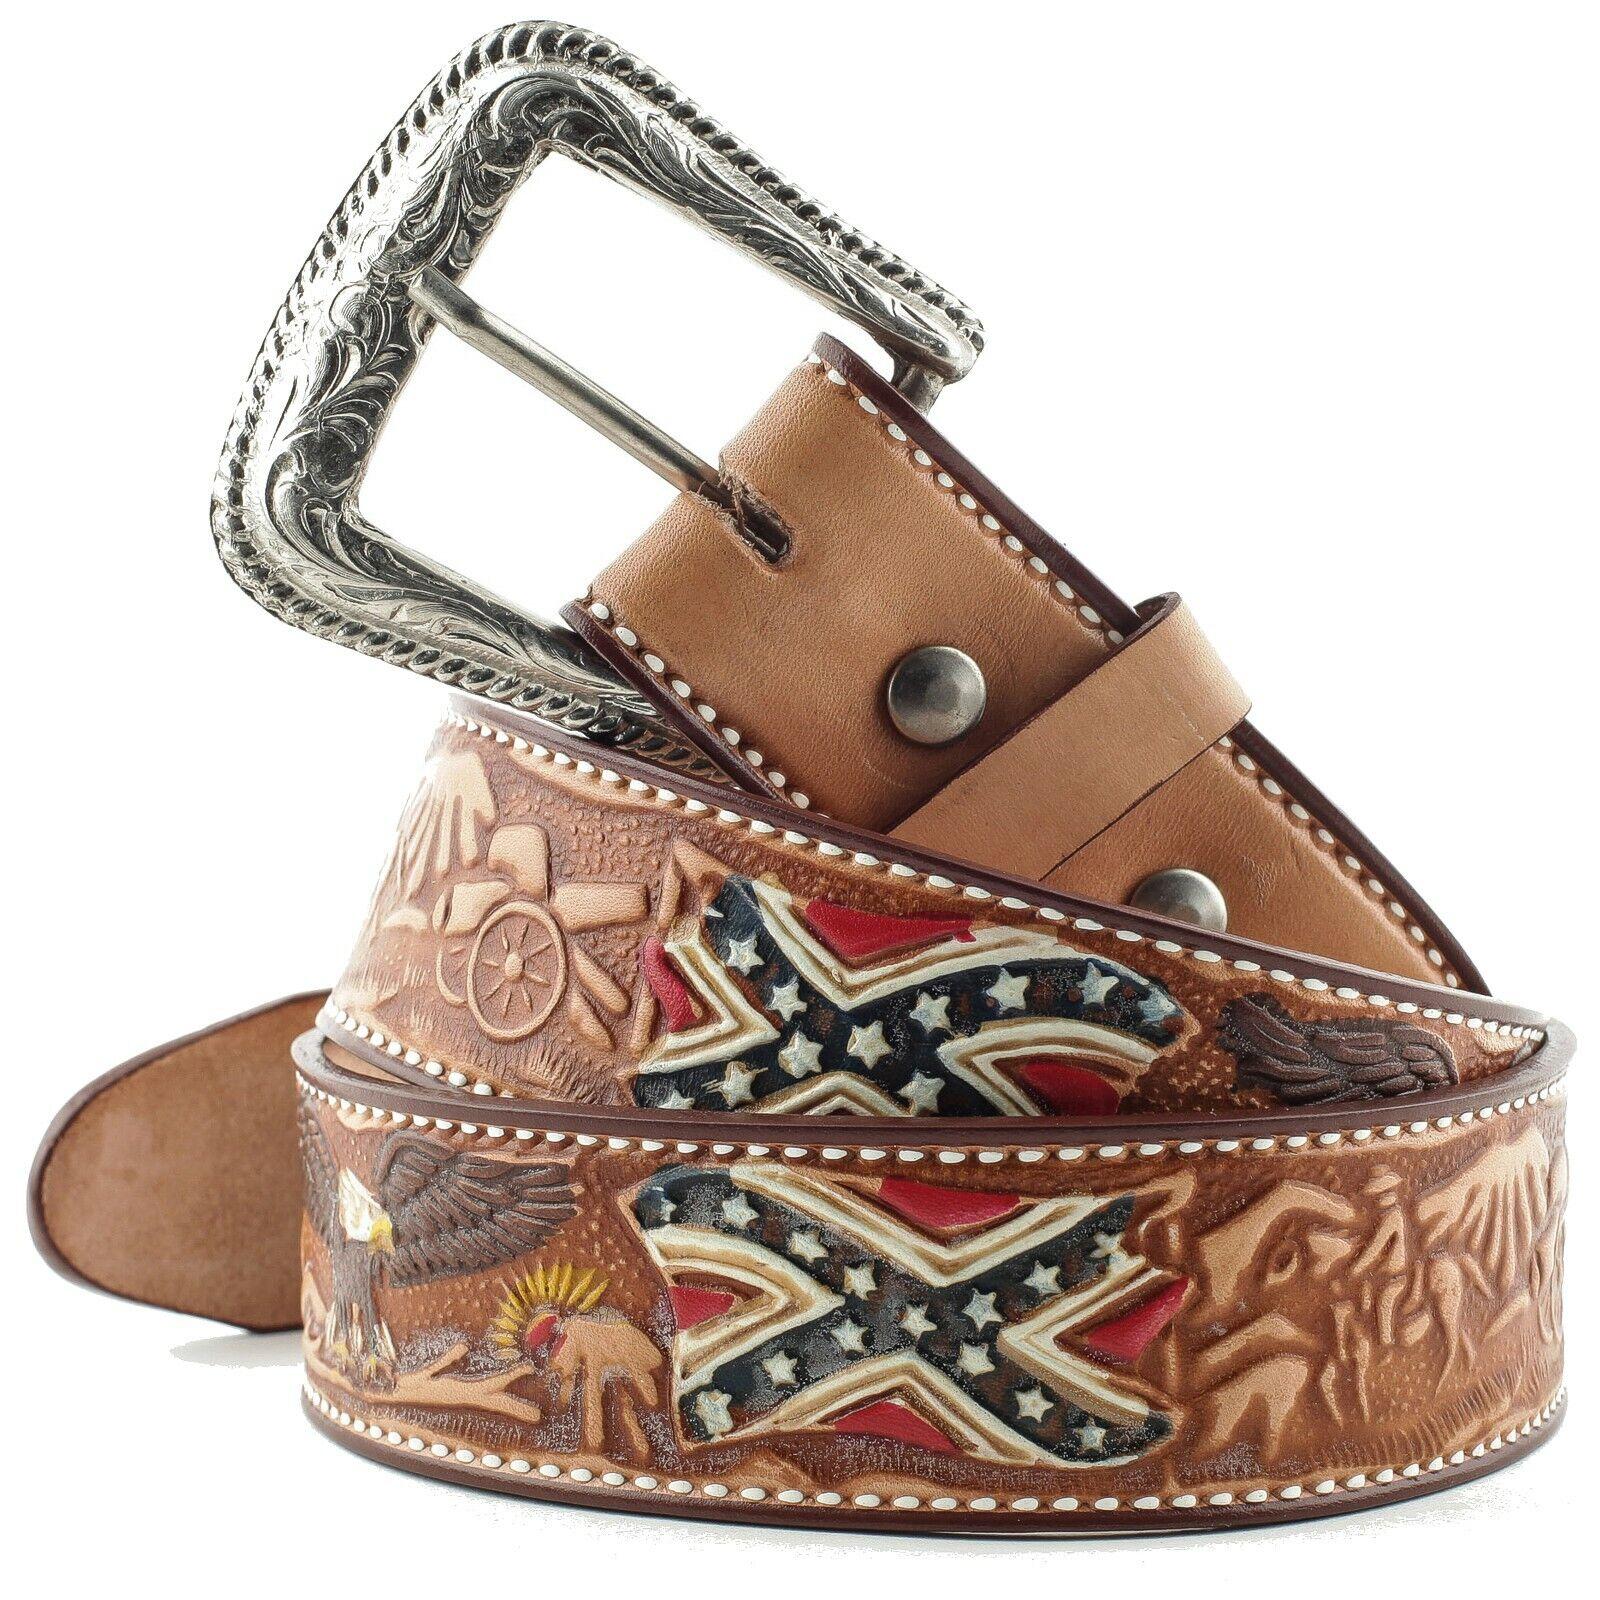 Gürtel Ledergürtel Westerngürtel Cowboygürtel Country Leder Unisex »WG-12« Braun